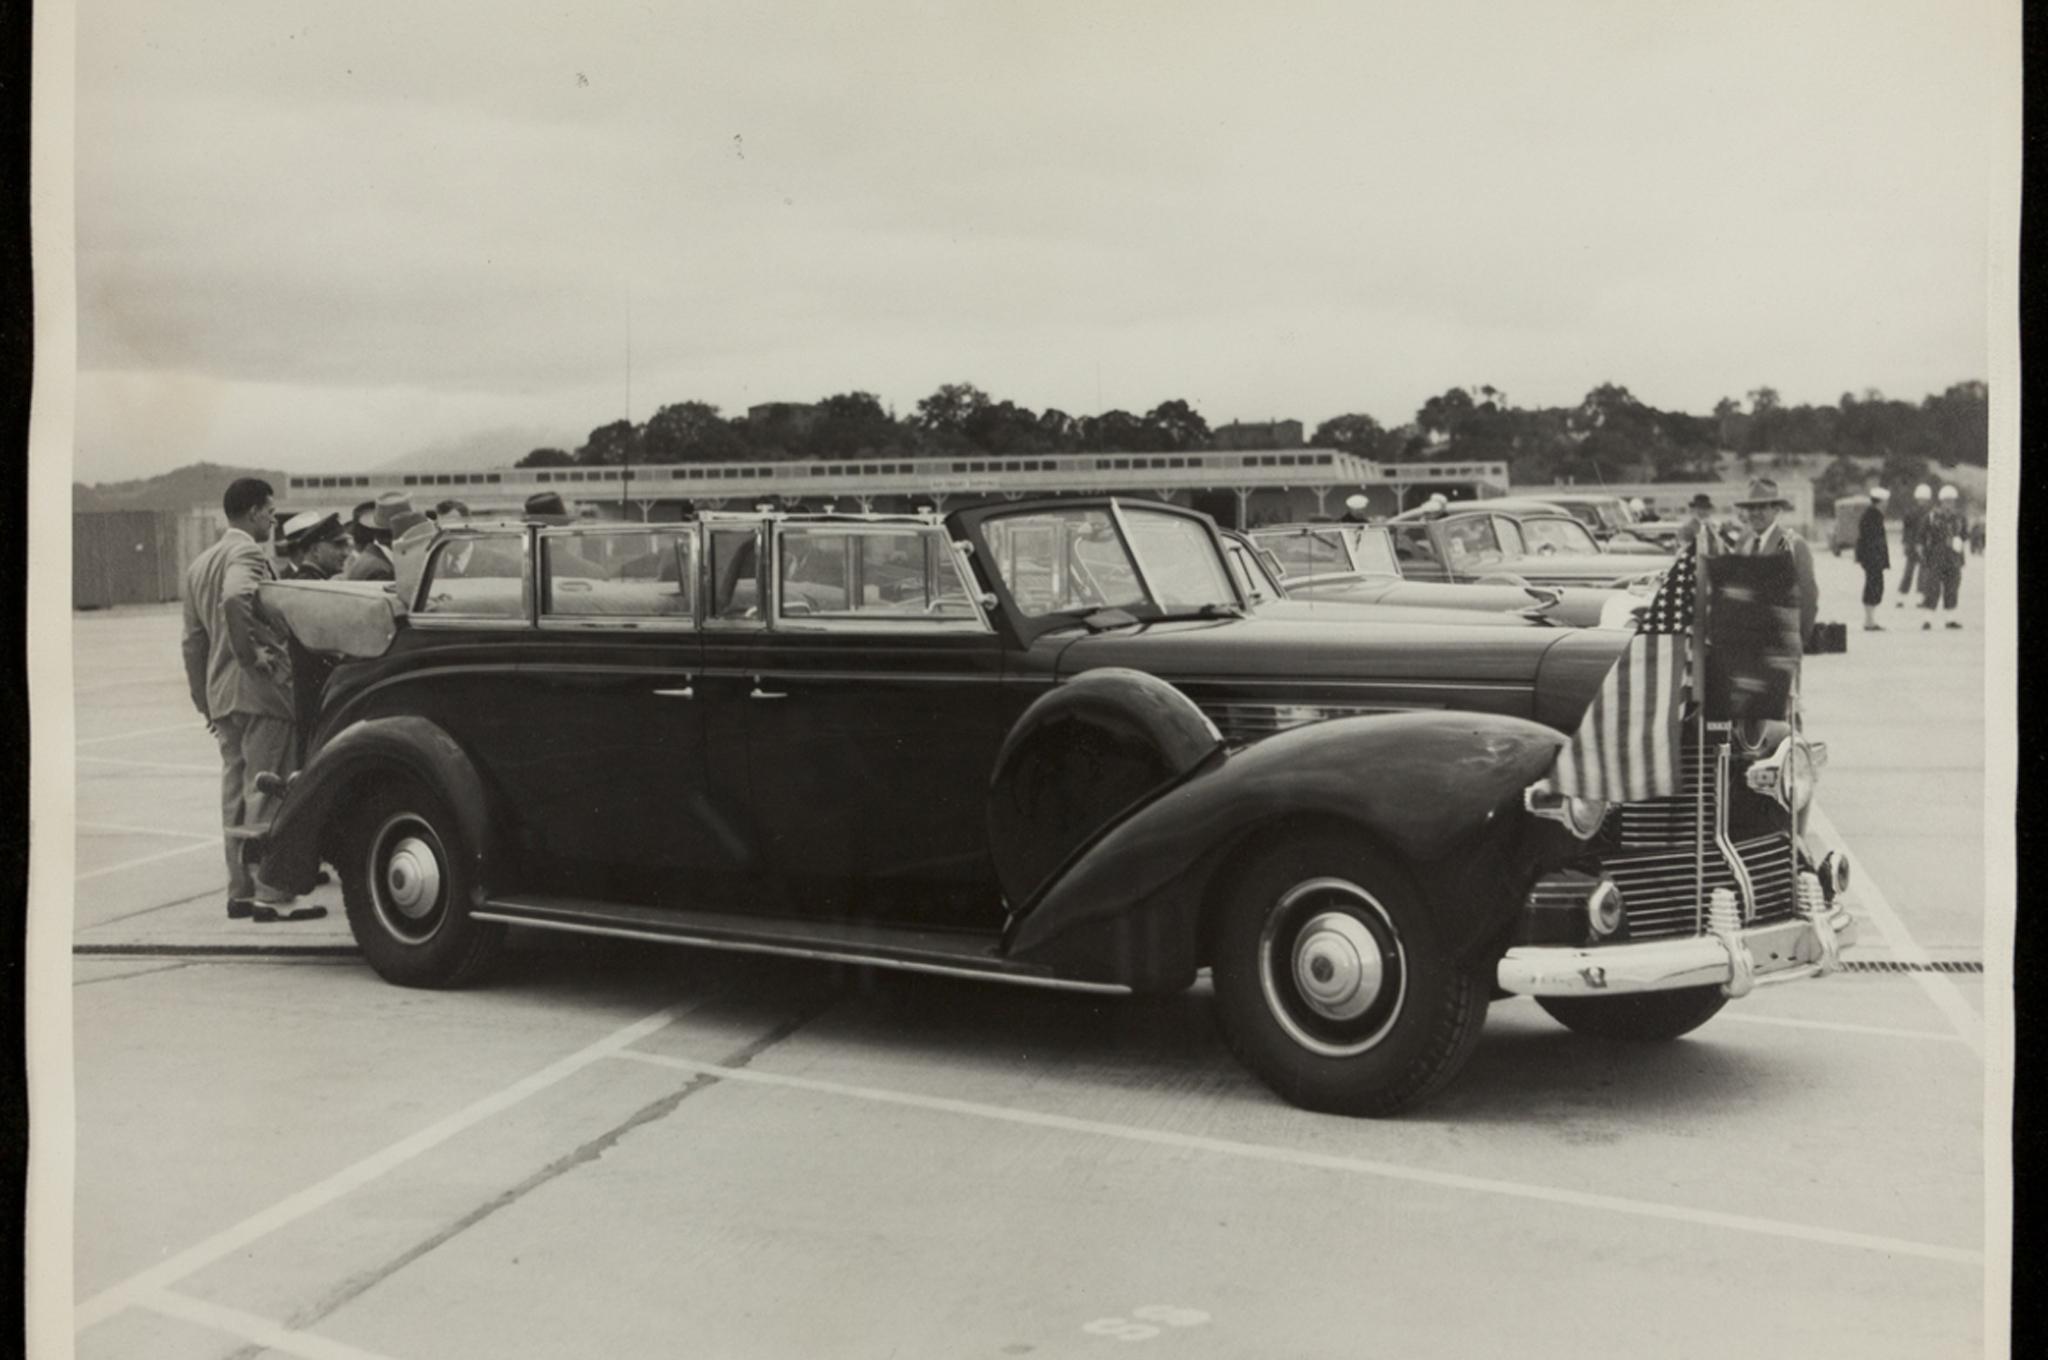 presidential-limousine-sunshine-special-1939-lincoln-roosevelt